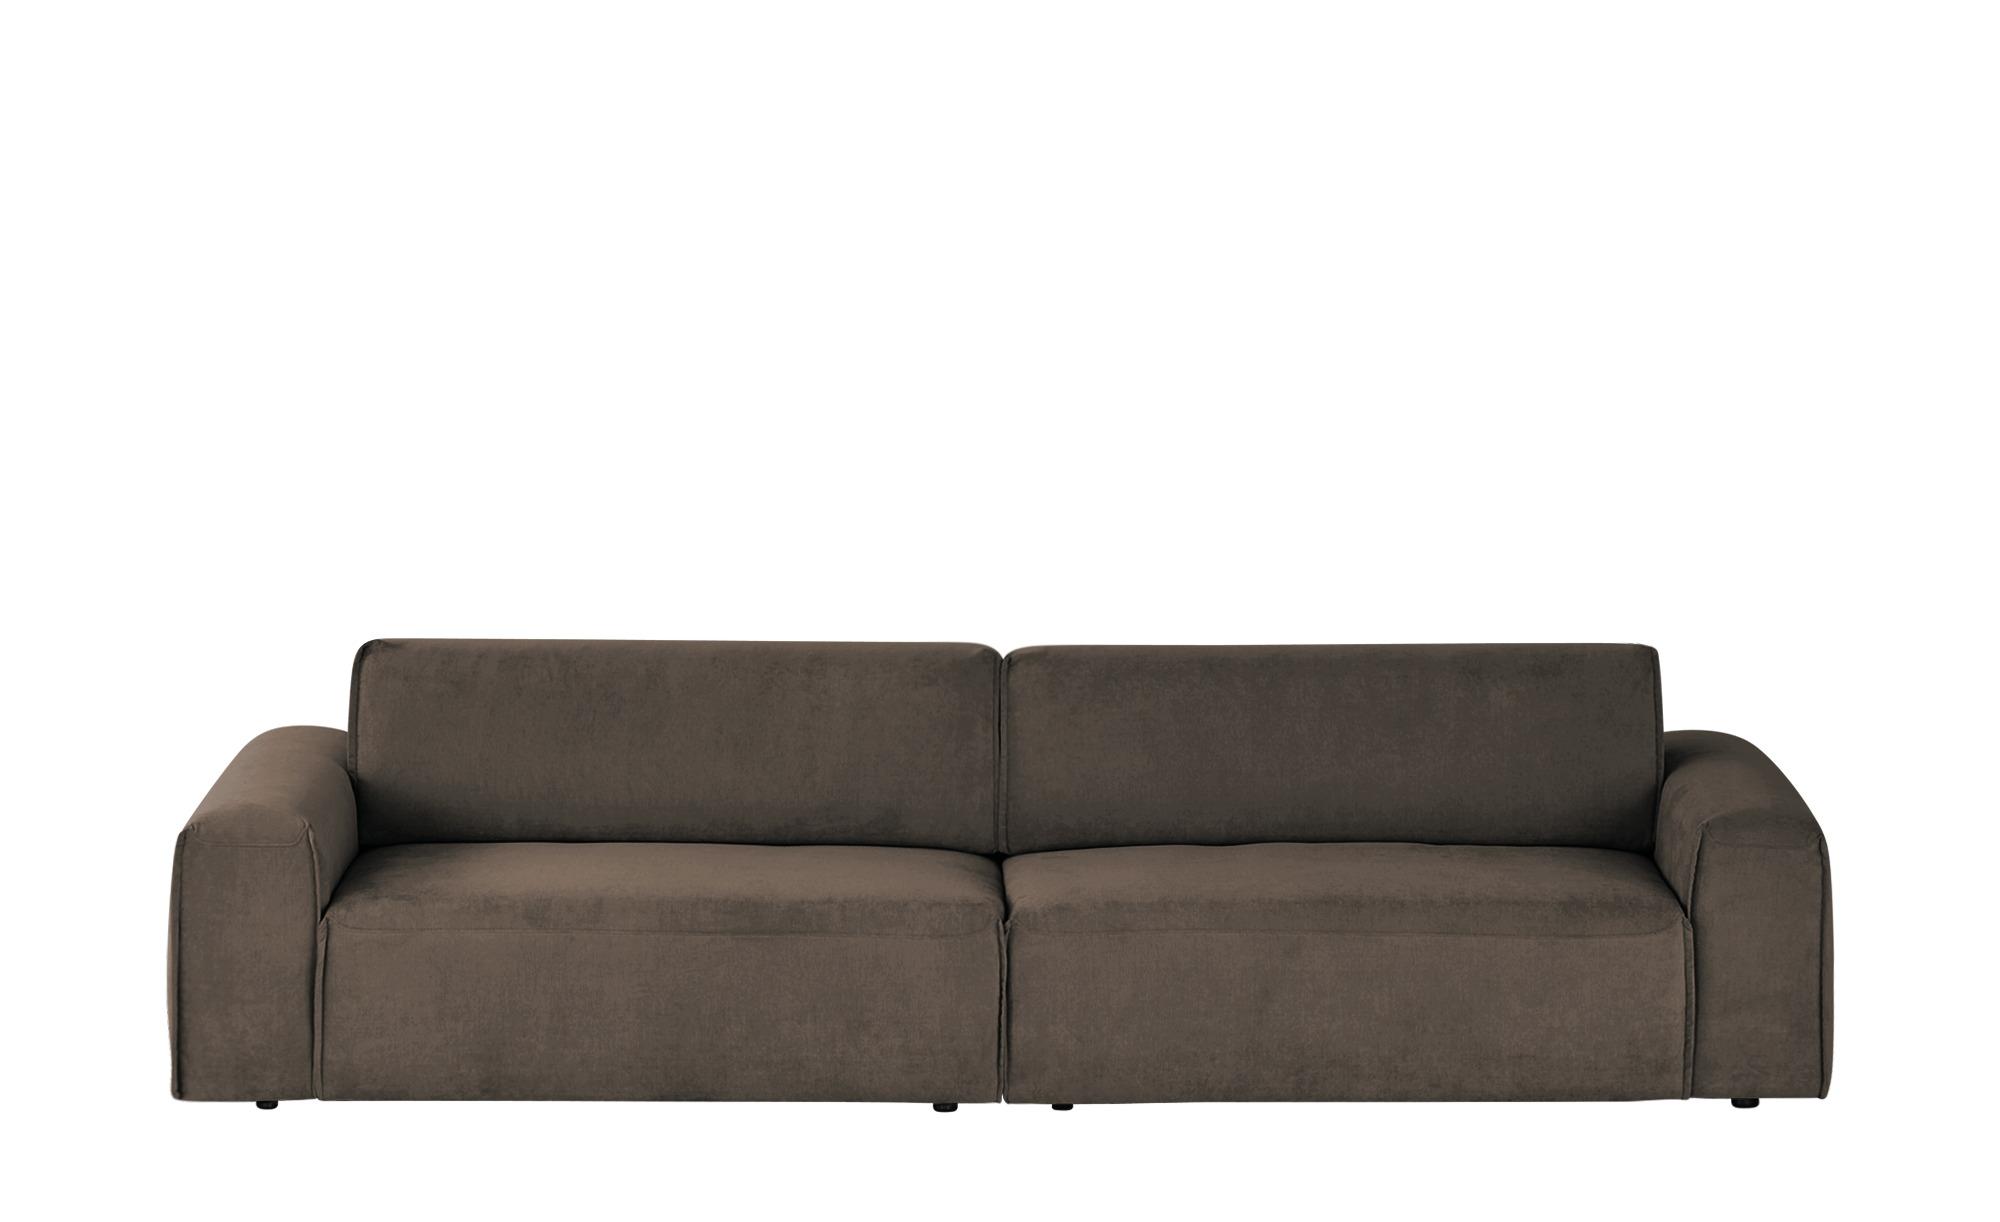 Max Schelling Big Sofa  Life ¦ braun ¦ Maße (cm): B: 296 T: 120 Polstermöbel > Sofas > Big-Sofas - Höffner